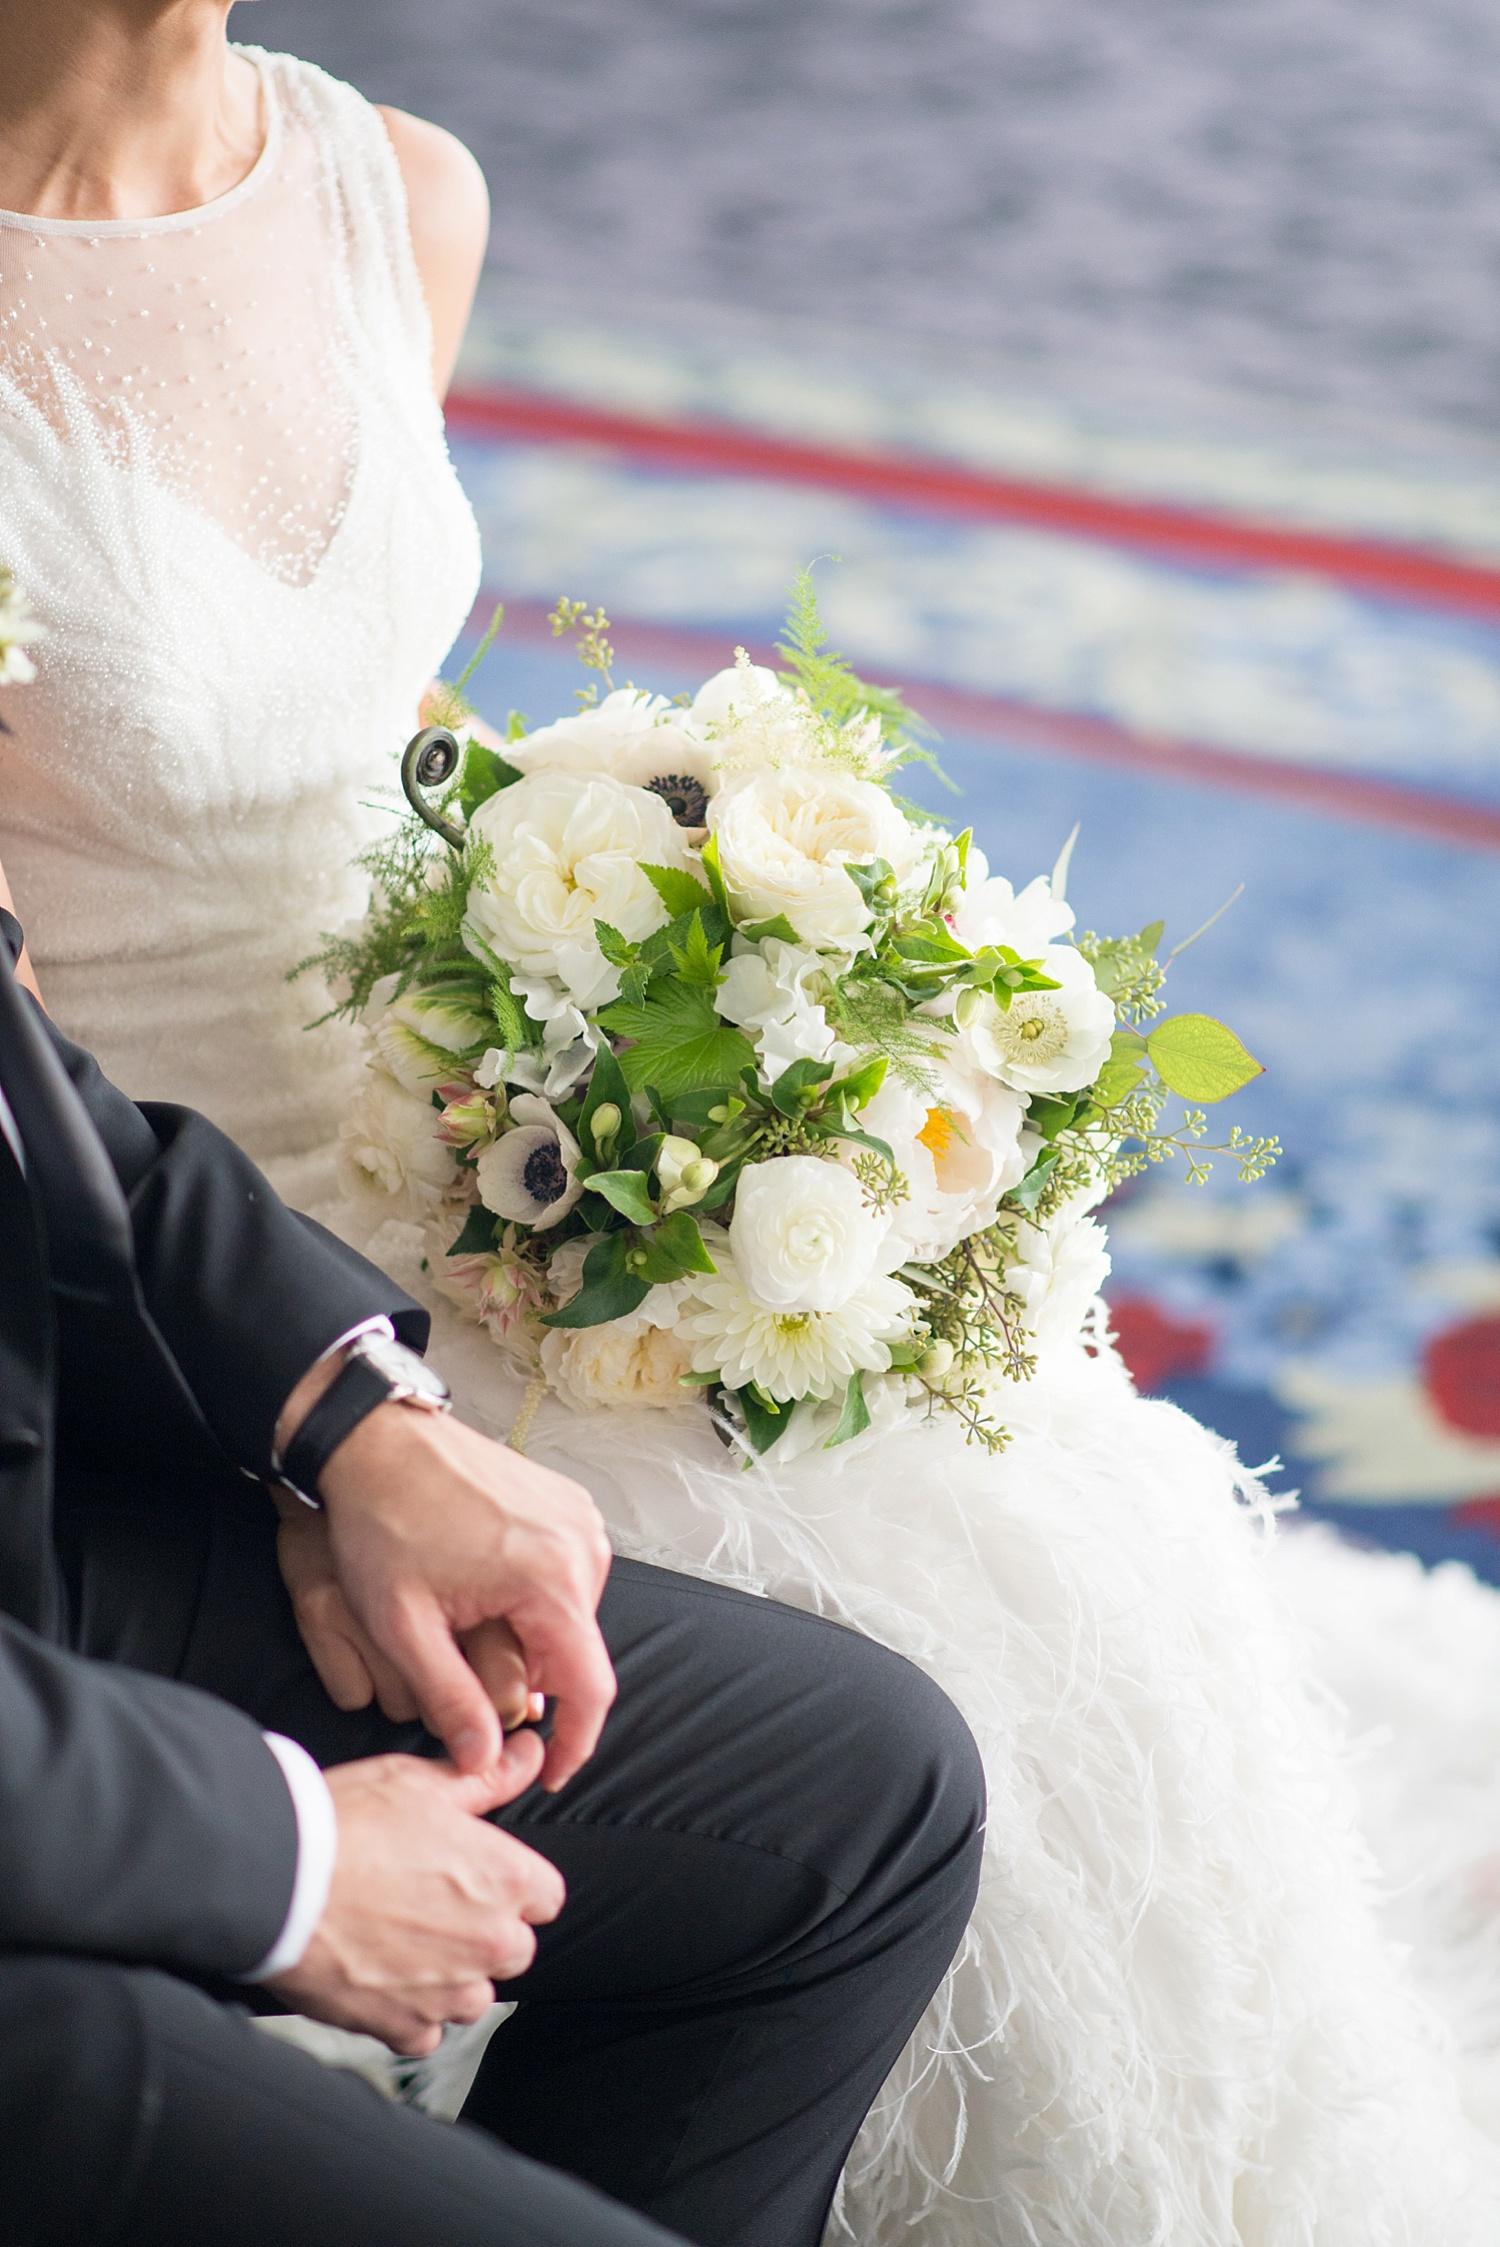 mikkelpaige-full_aperture_floral-pearl_river_hilton_wedding_0004.jpg